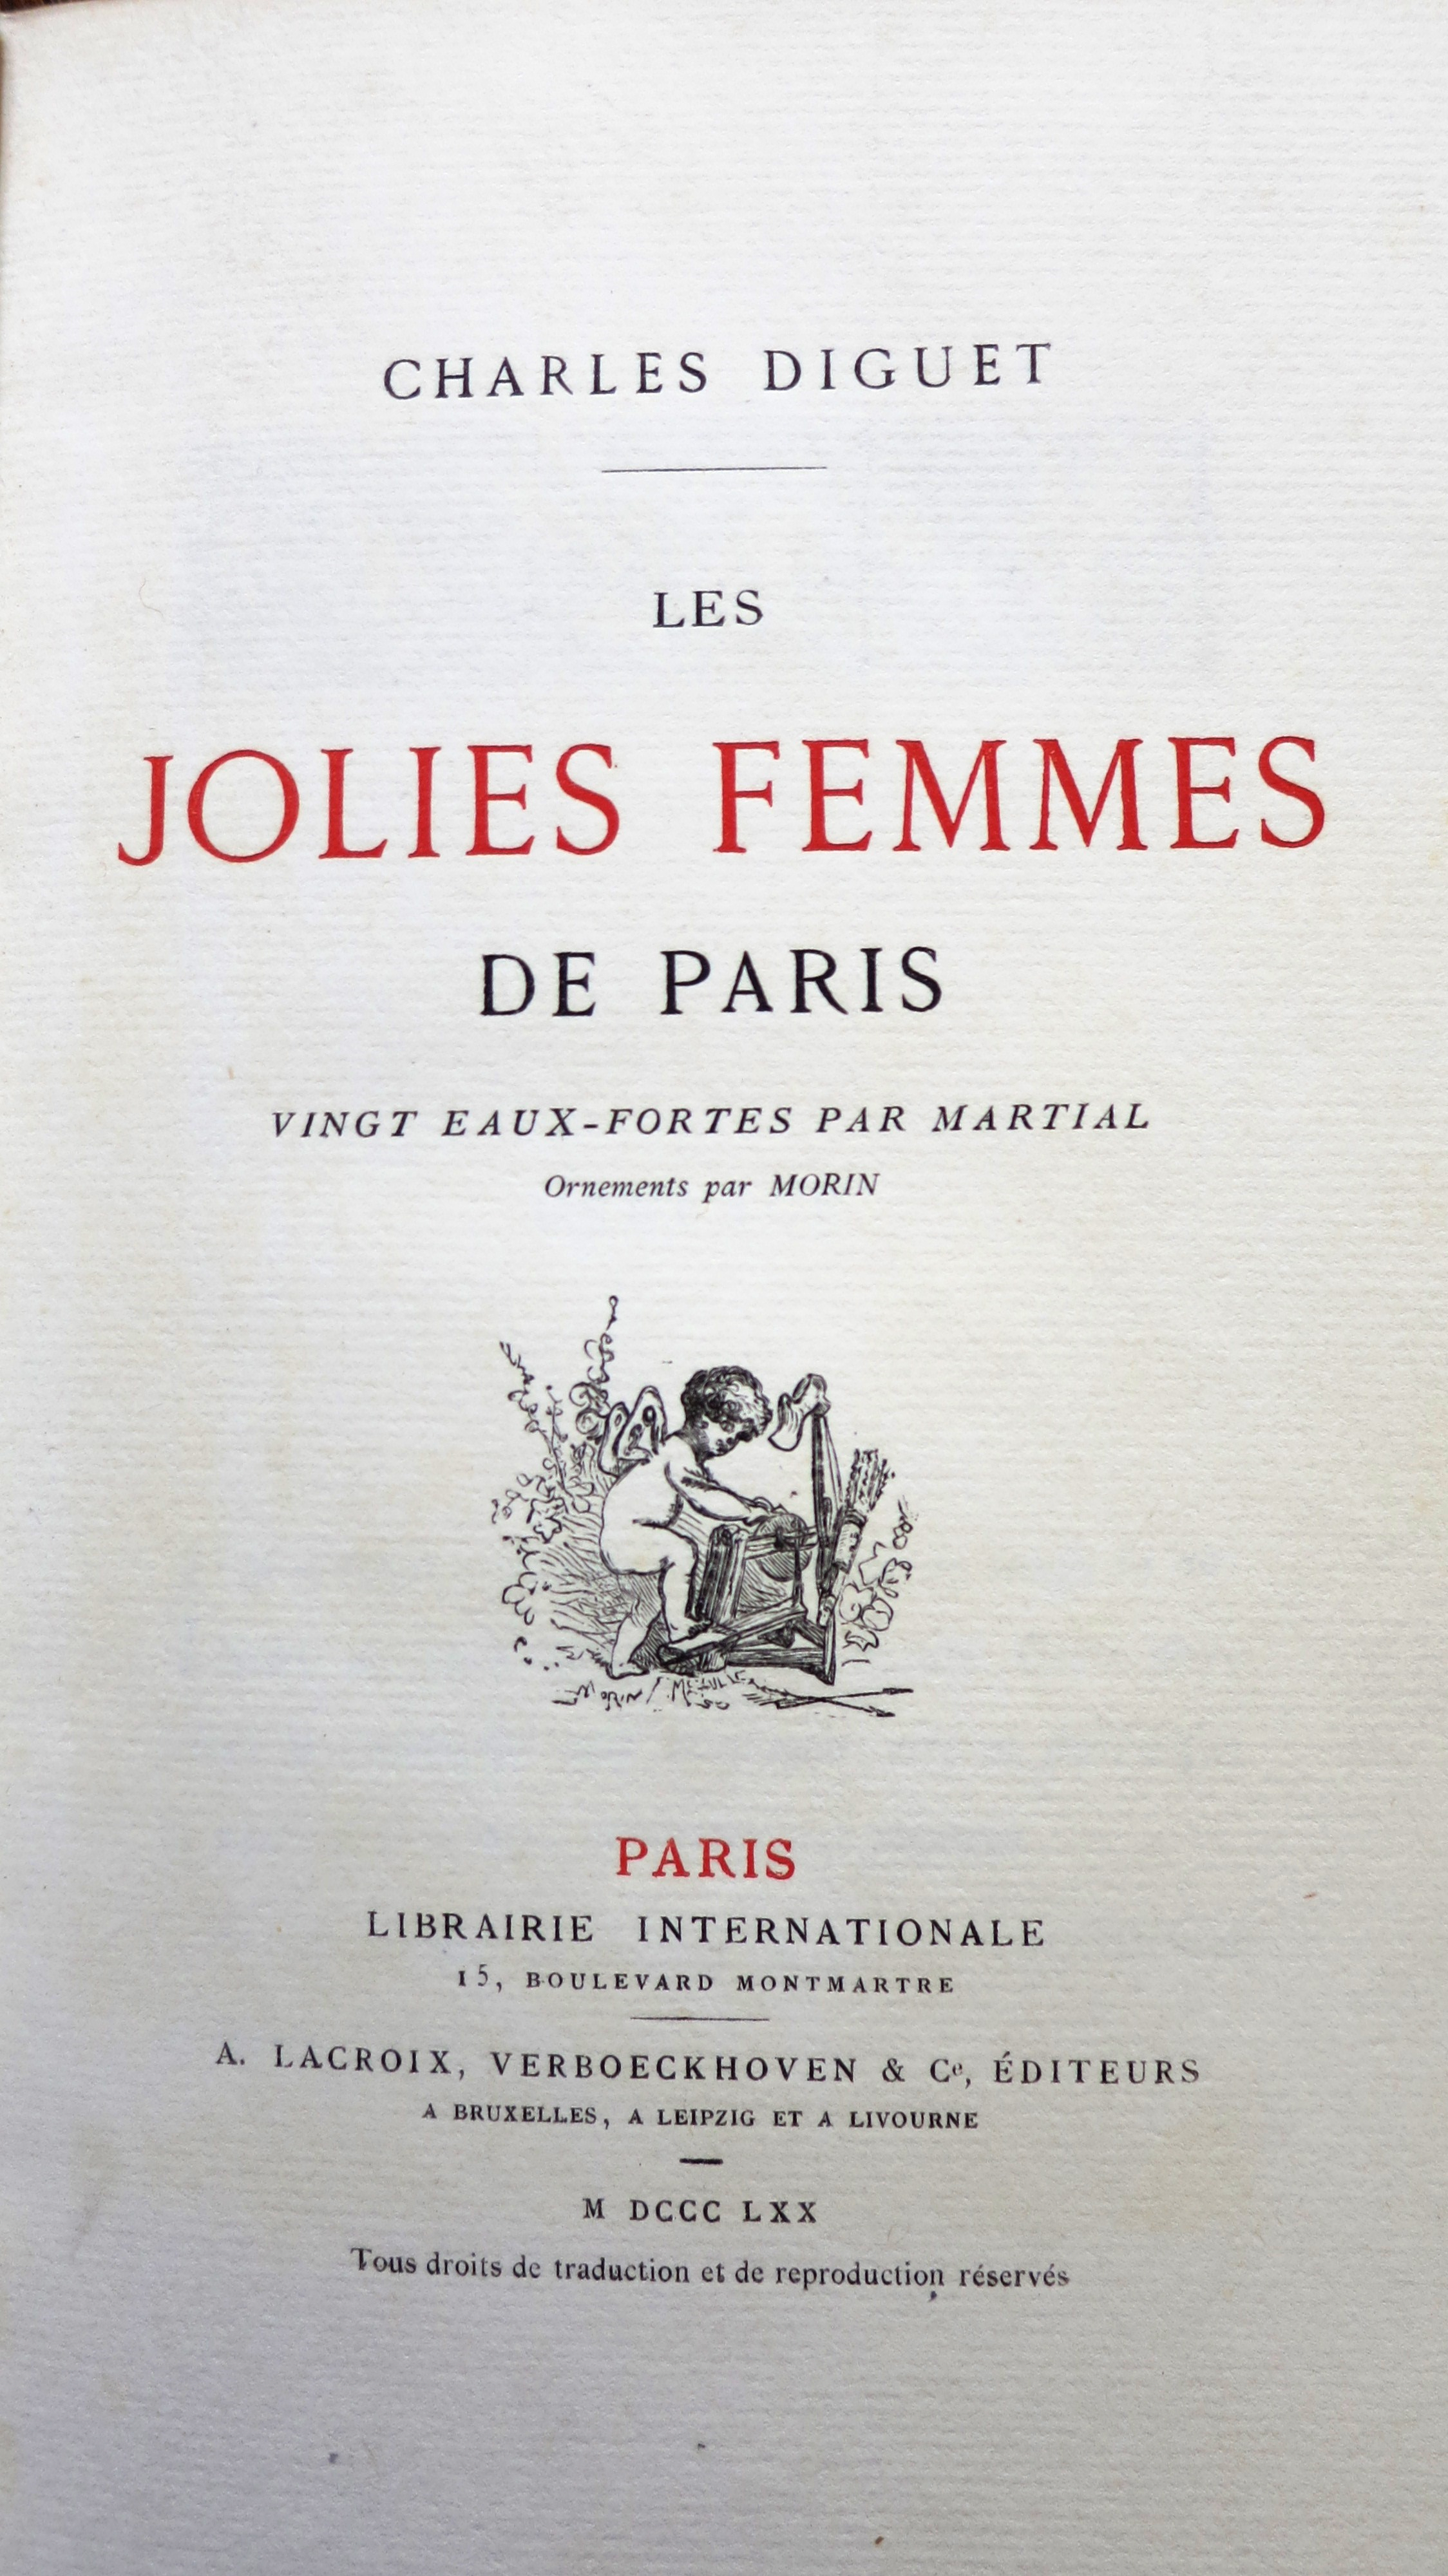 Les jolies femmes de Paris